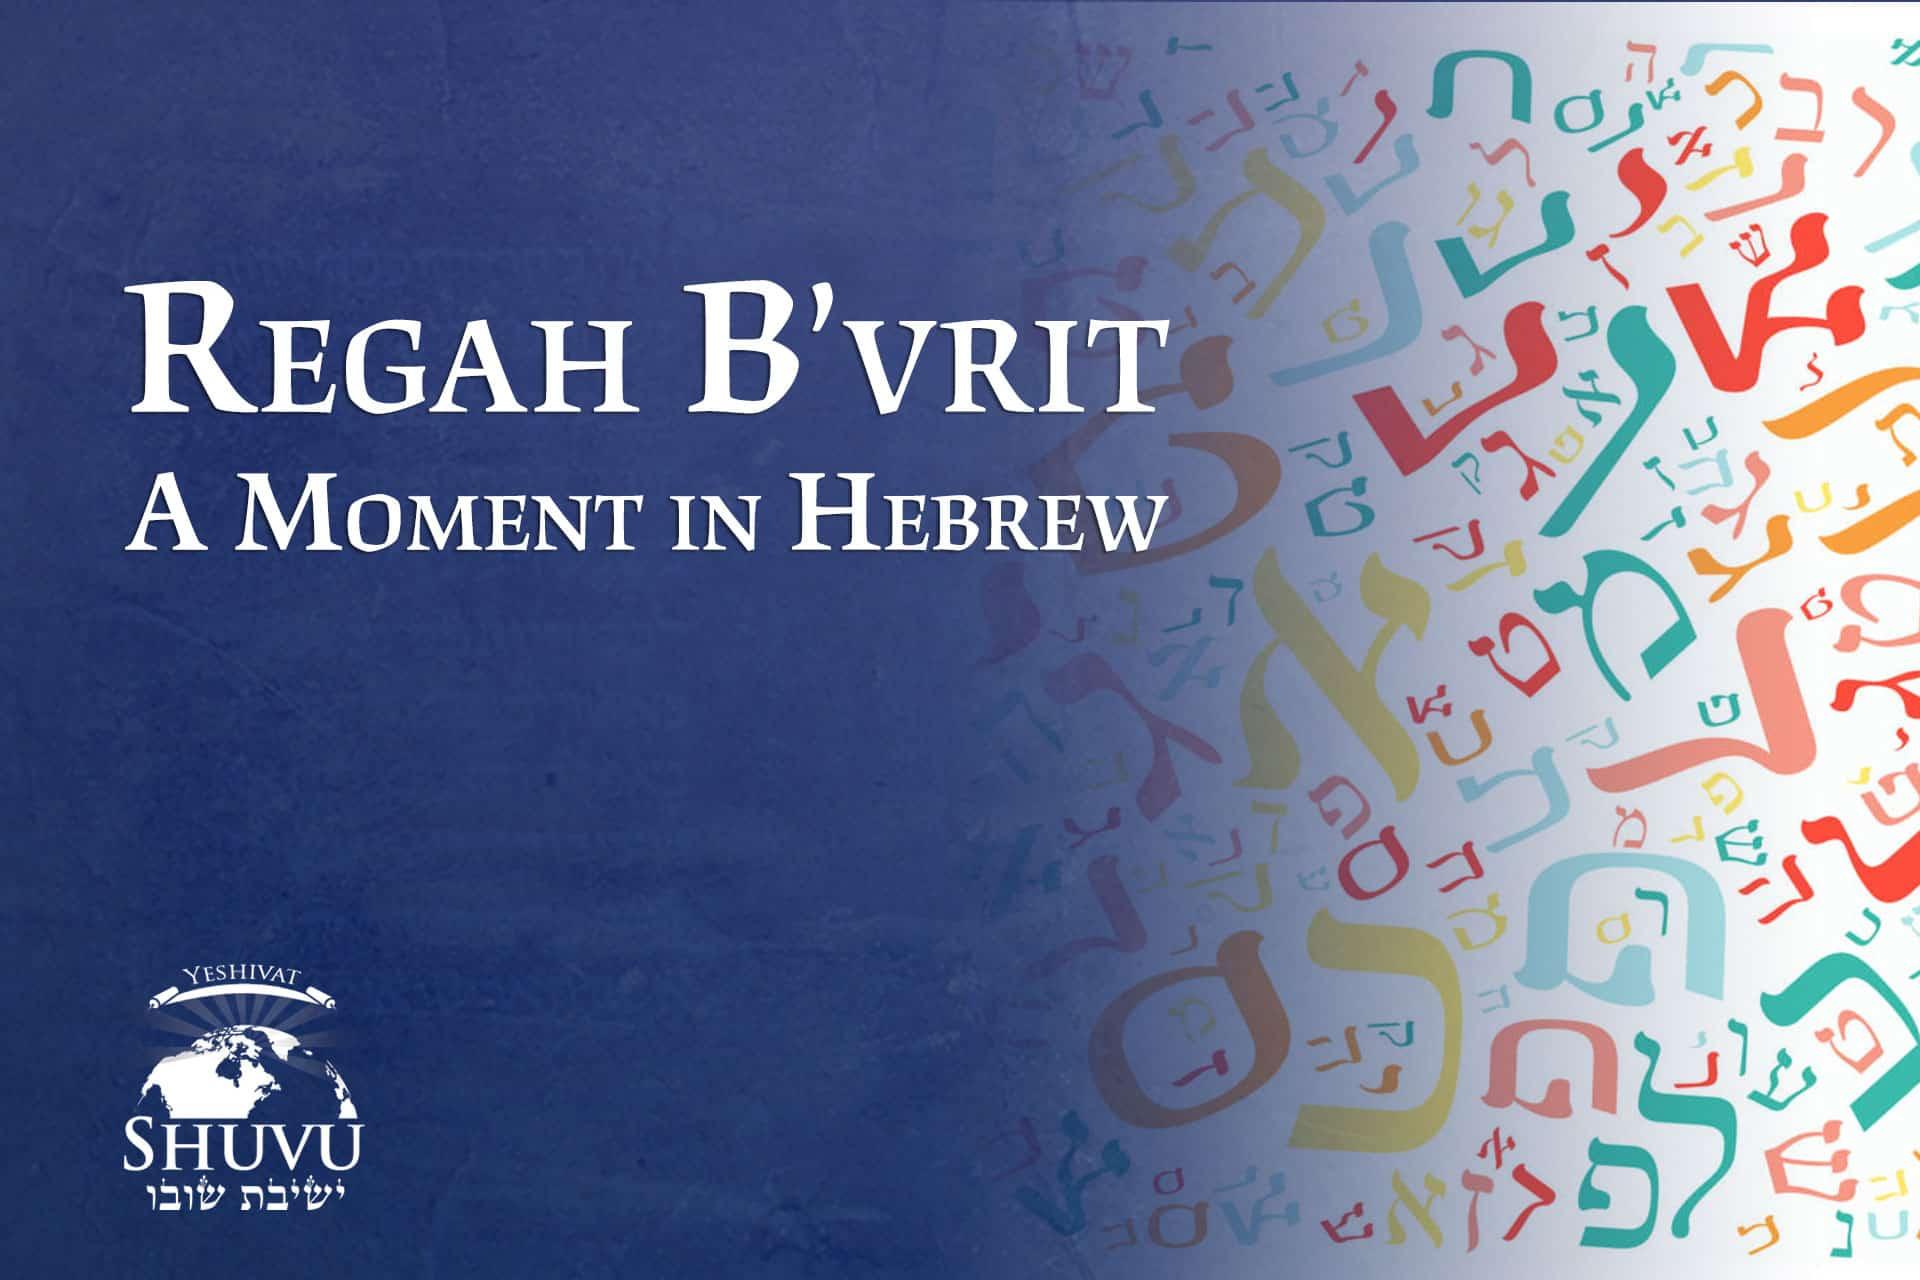 cover_yeshivat_shuvu_regah_bivrit_ENG